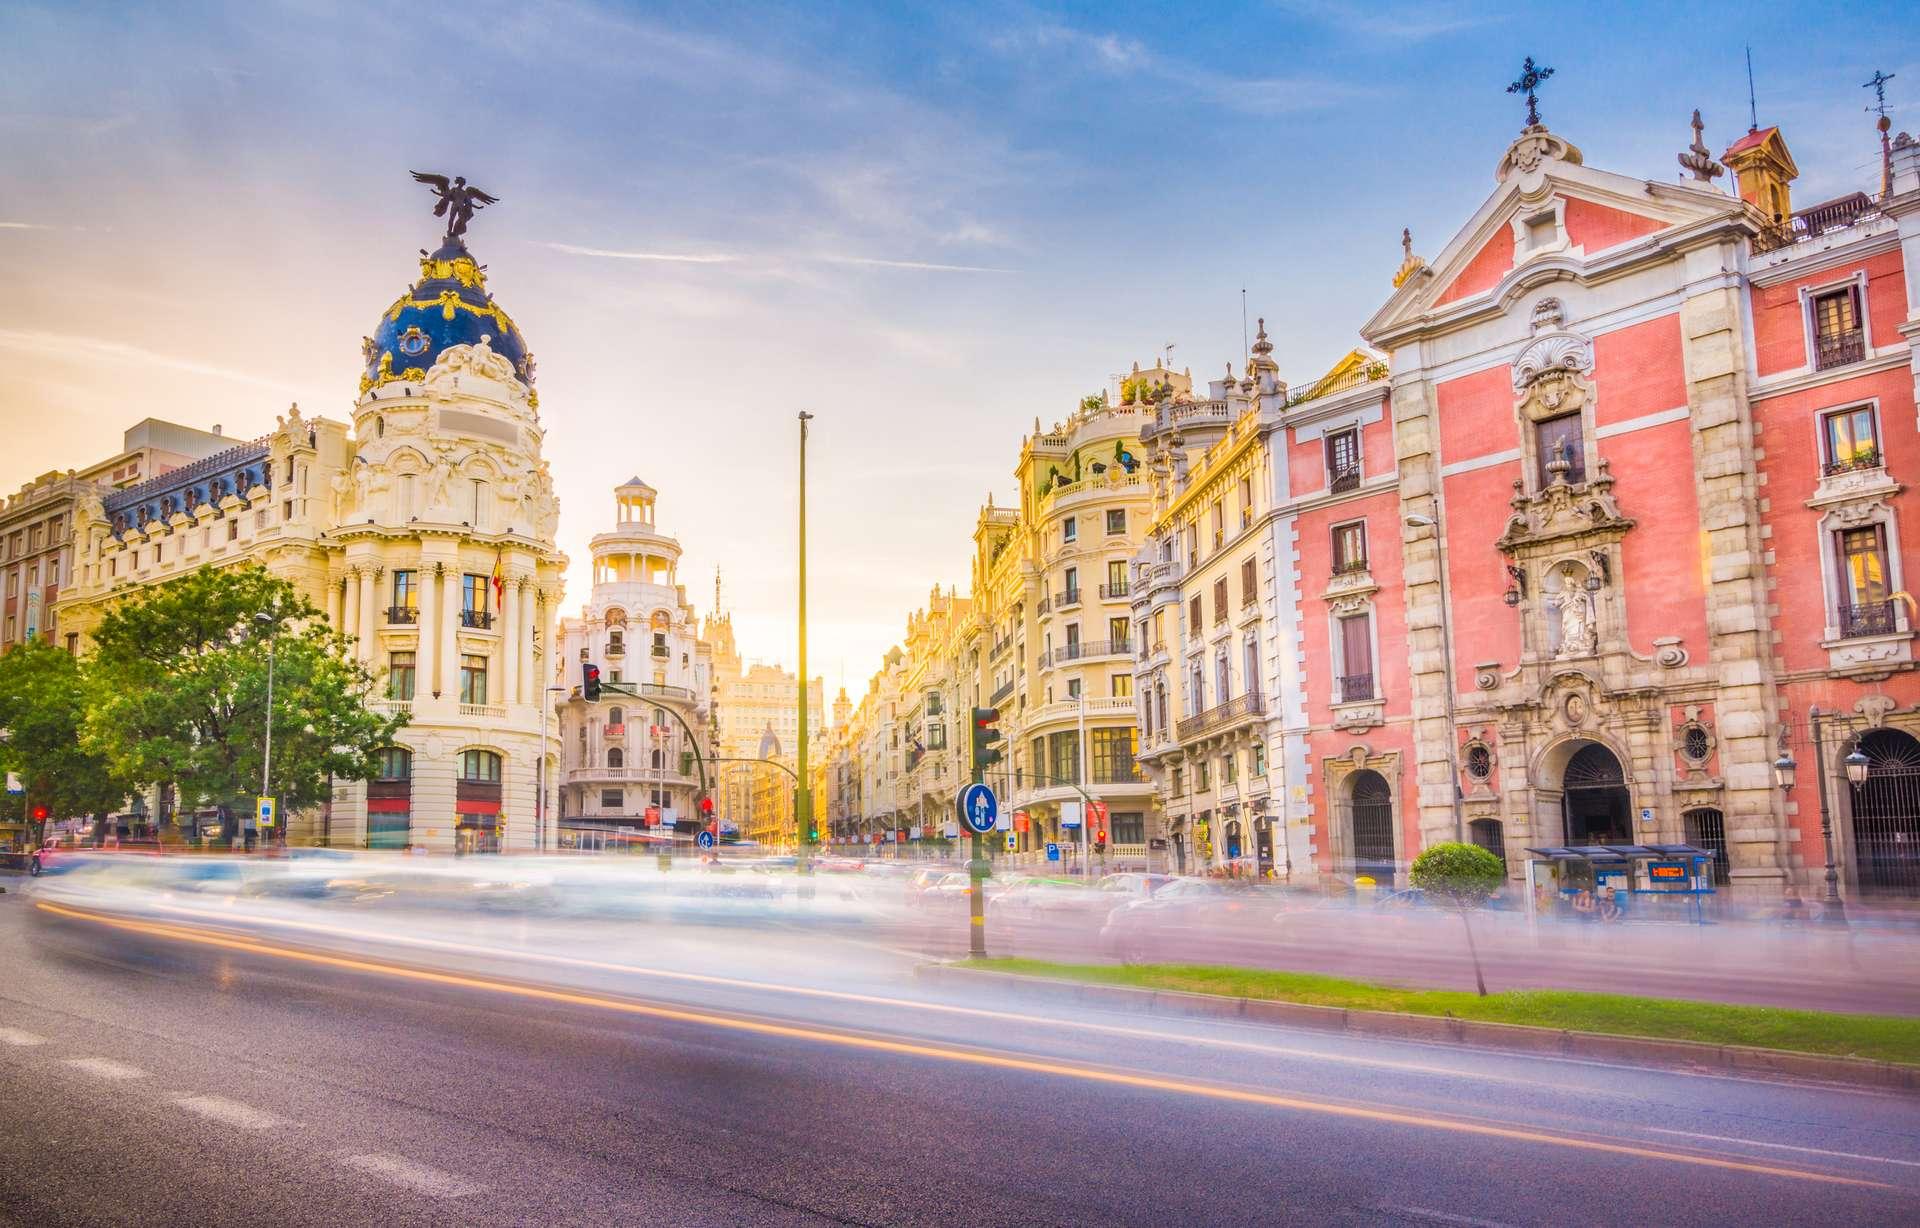 Spanje Madrid where the Calle de Alcala meets the Gran Via